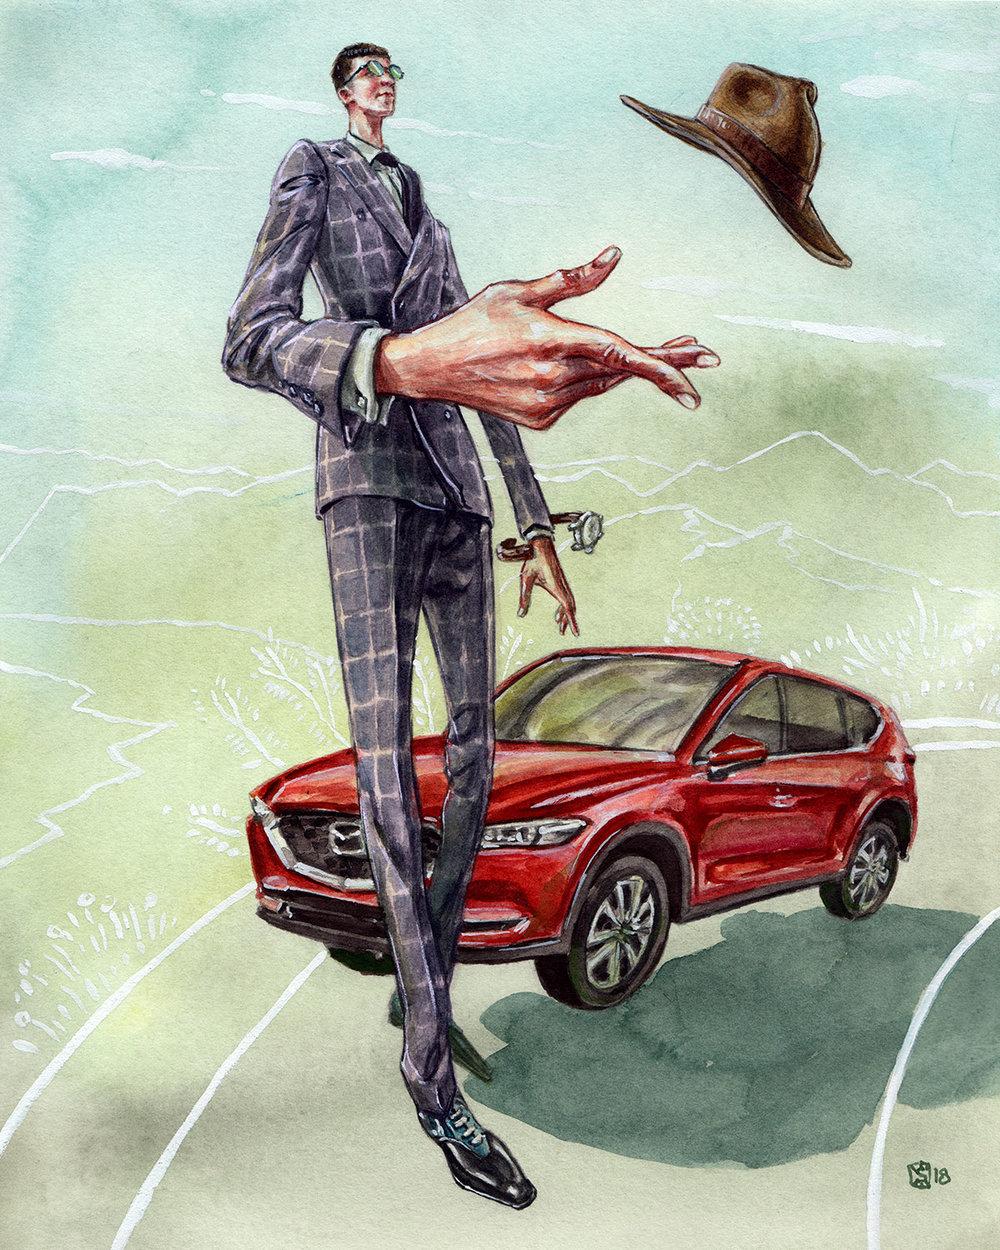 Mazda+CX-5+Road+Trip+fashion+illustration+by+Sunflowerman.jpeg